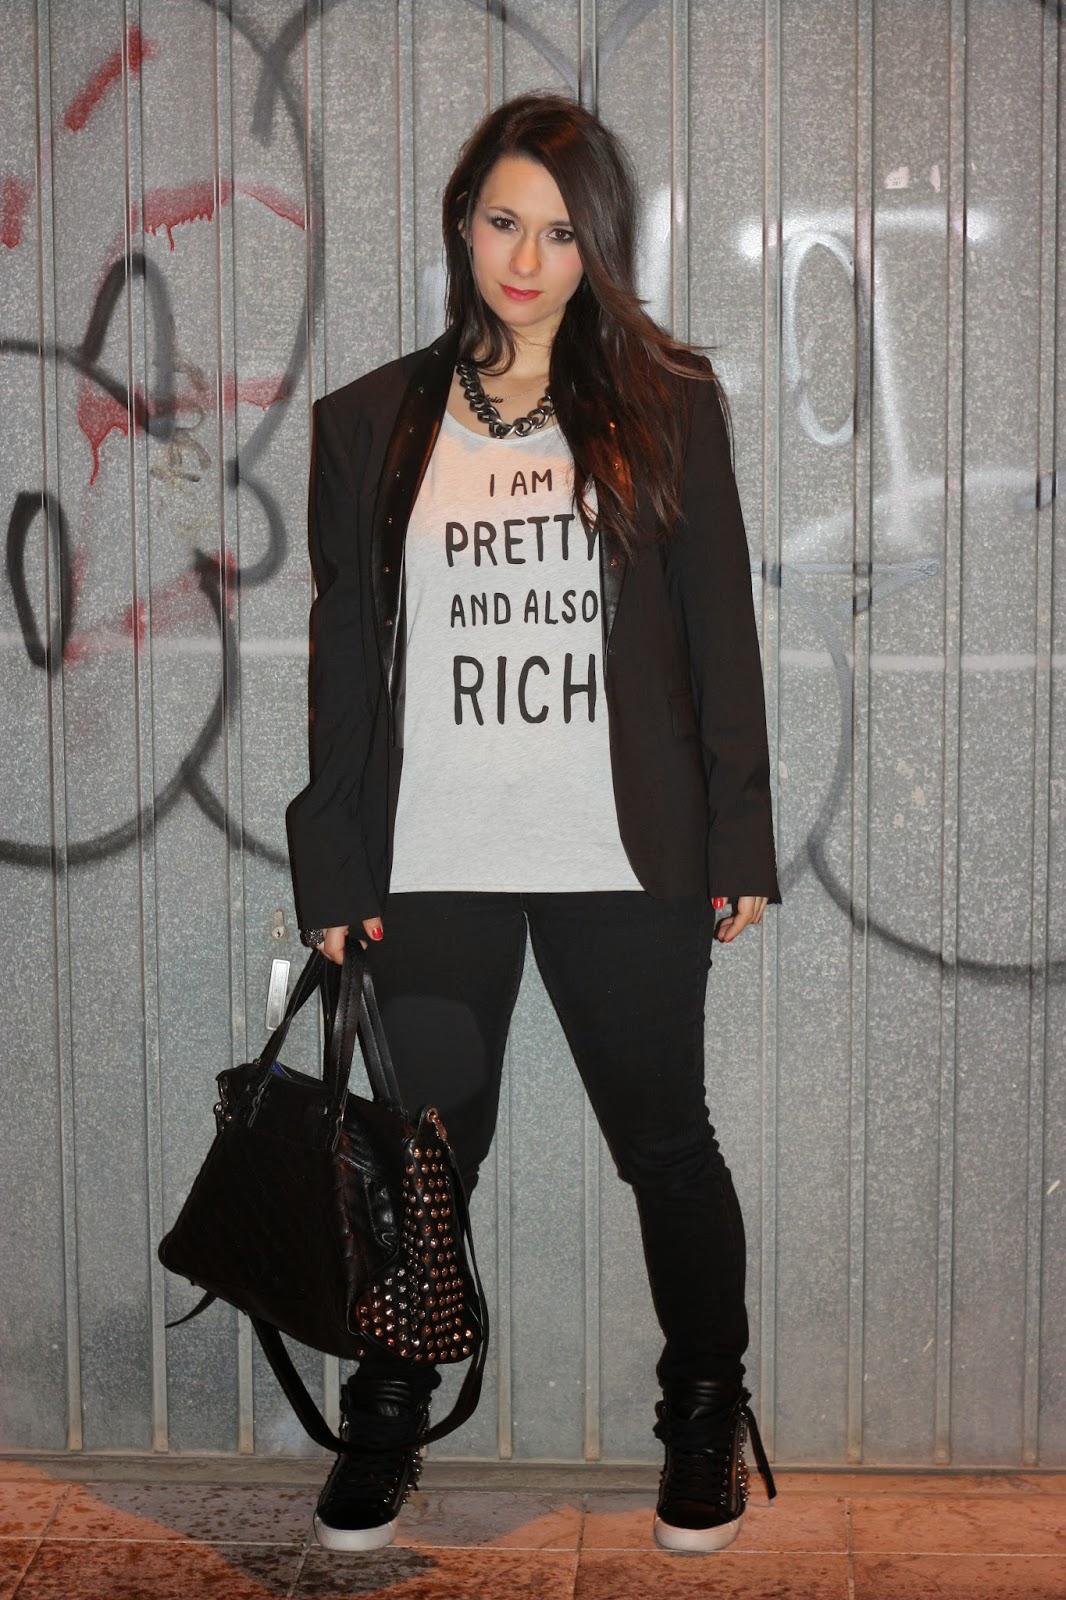 http://silviparalasamigas.blogspot.com.es/2014/03/camiseta-mensaje.html